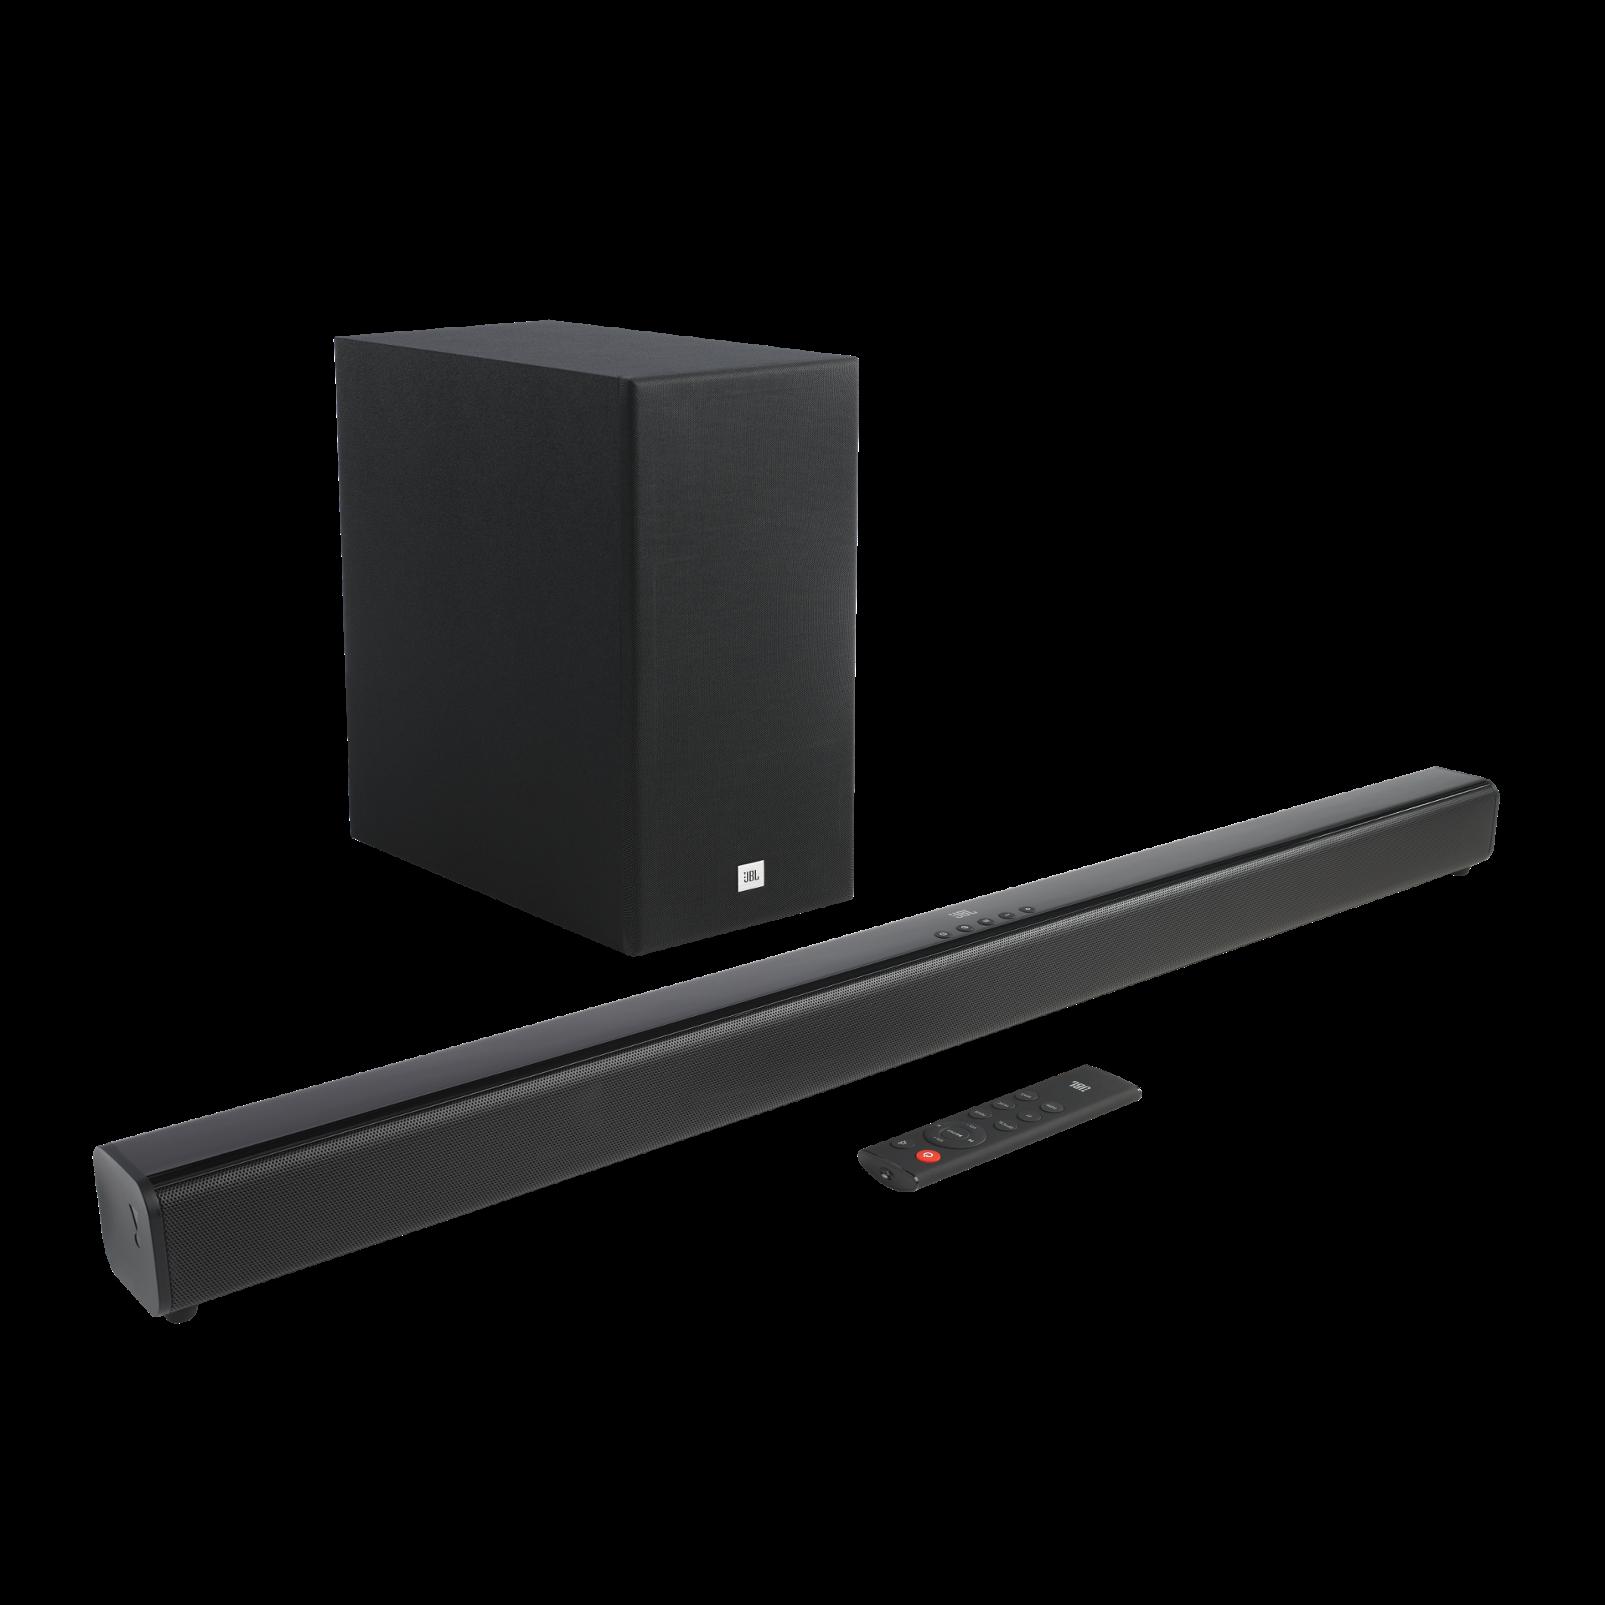 Cinema SB160, Soundbar, Bluetooth, Wireless Subwoofer